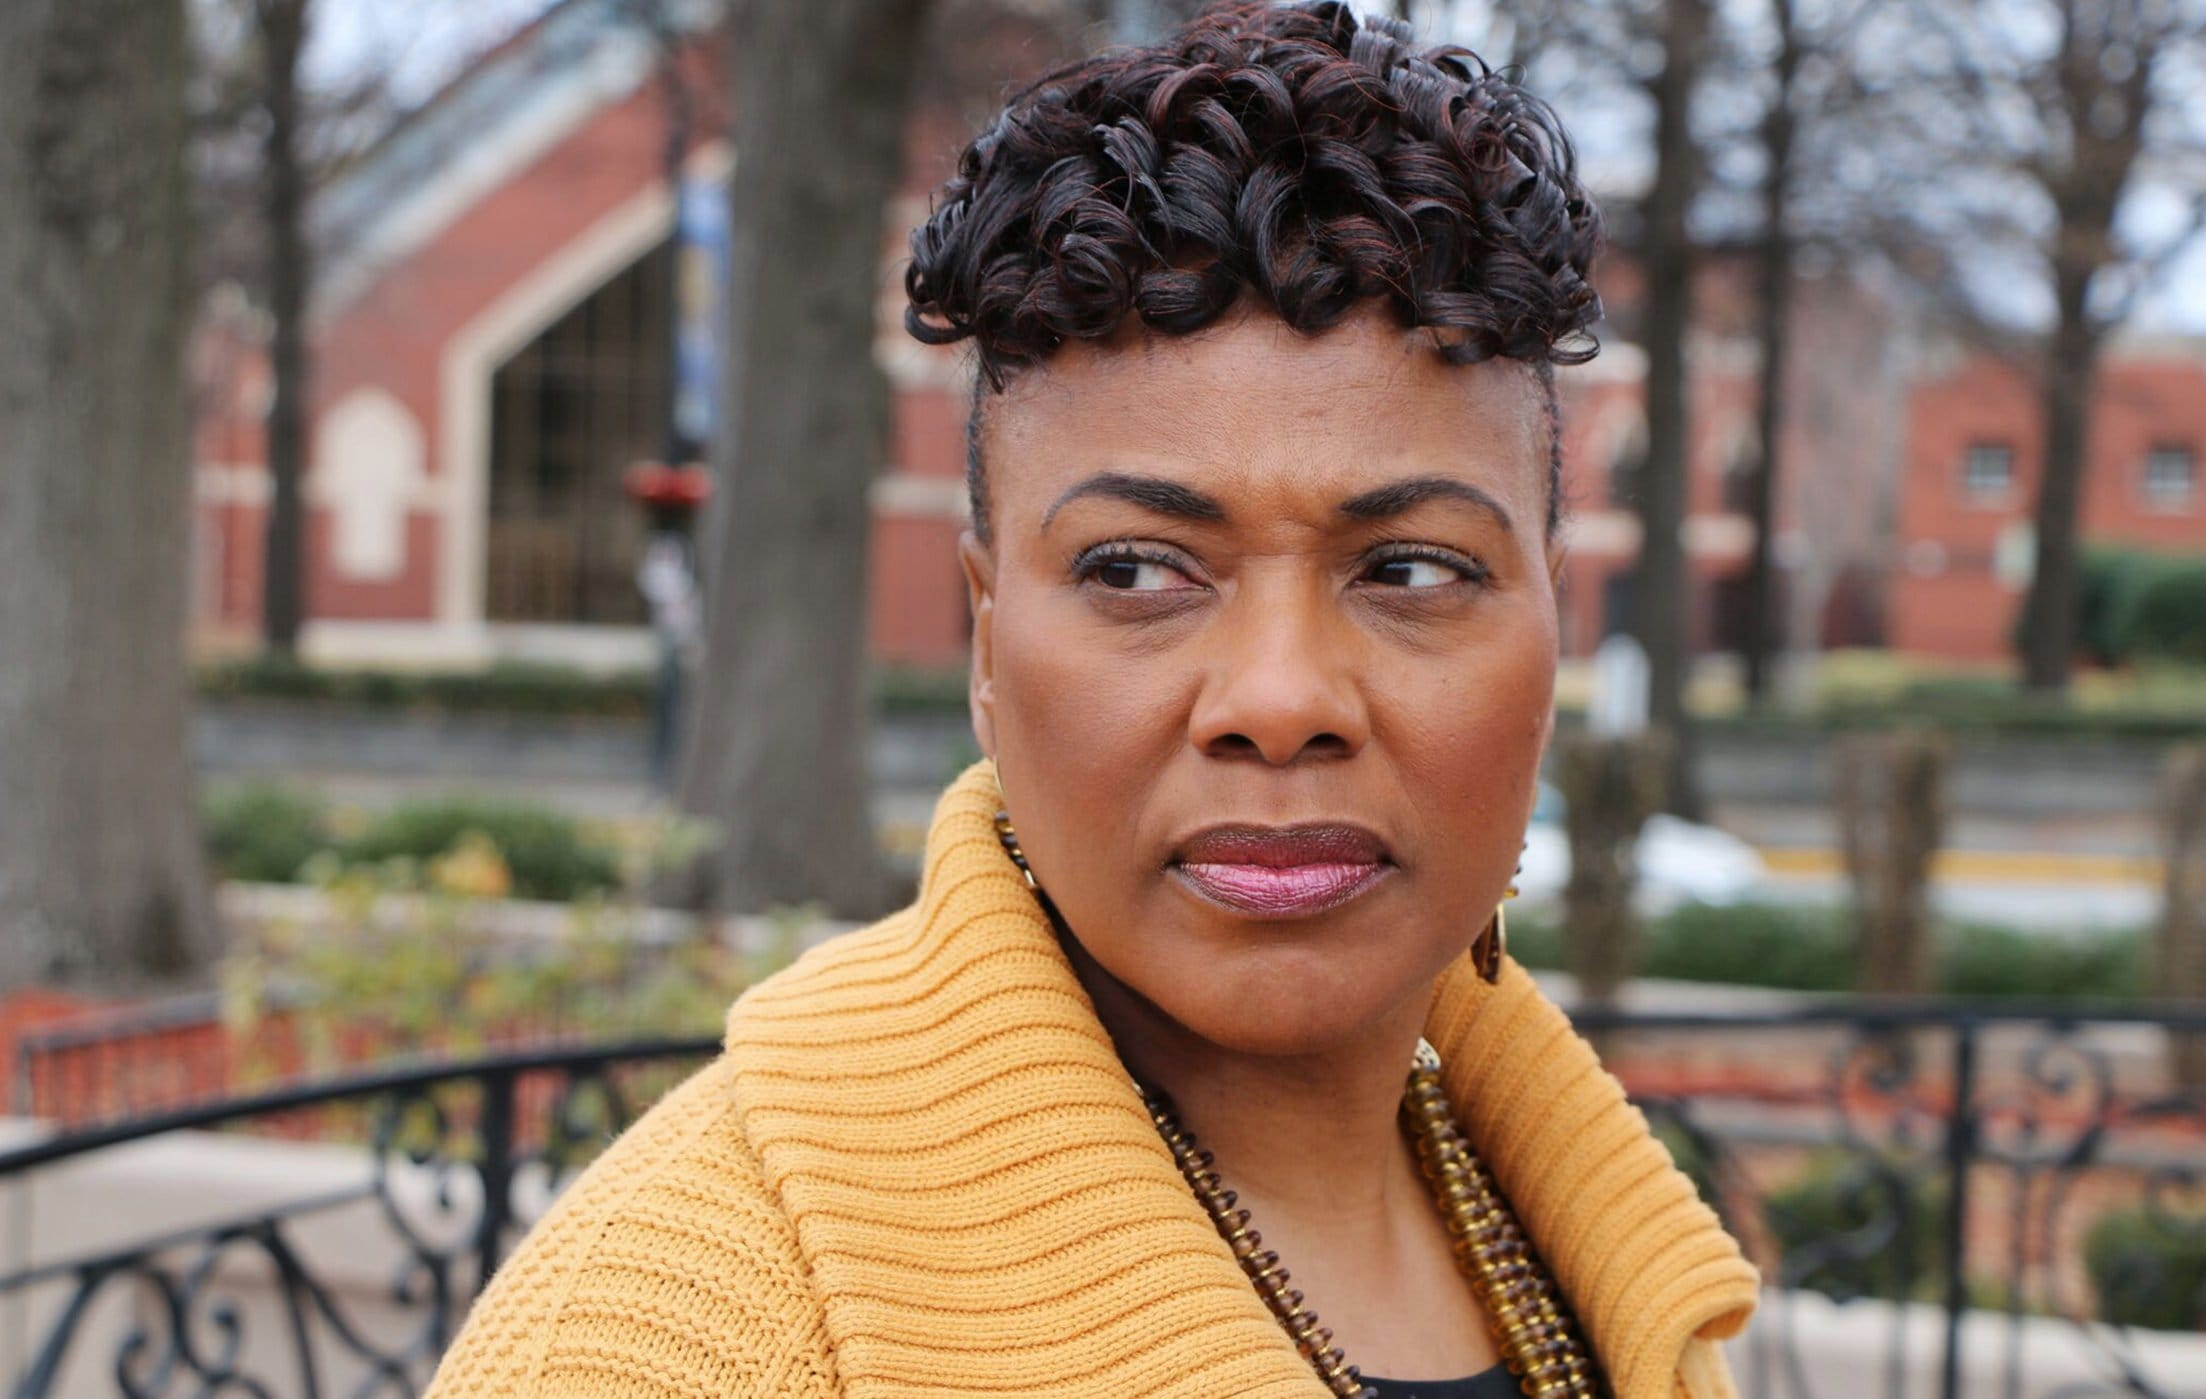 Dr. Martin Luther King Jr.'s daughter slams Comcast over